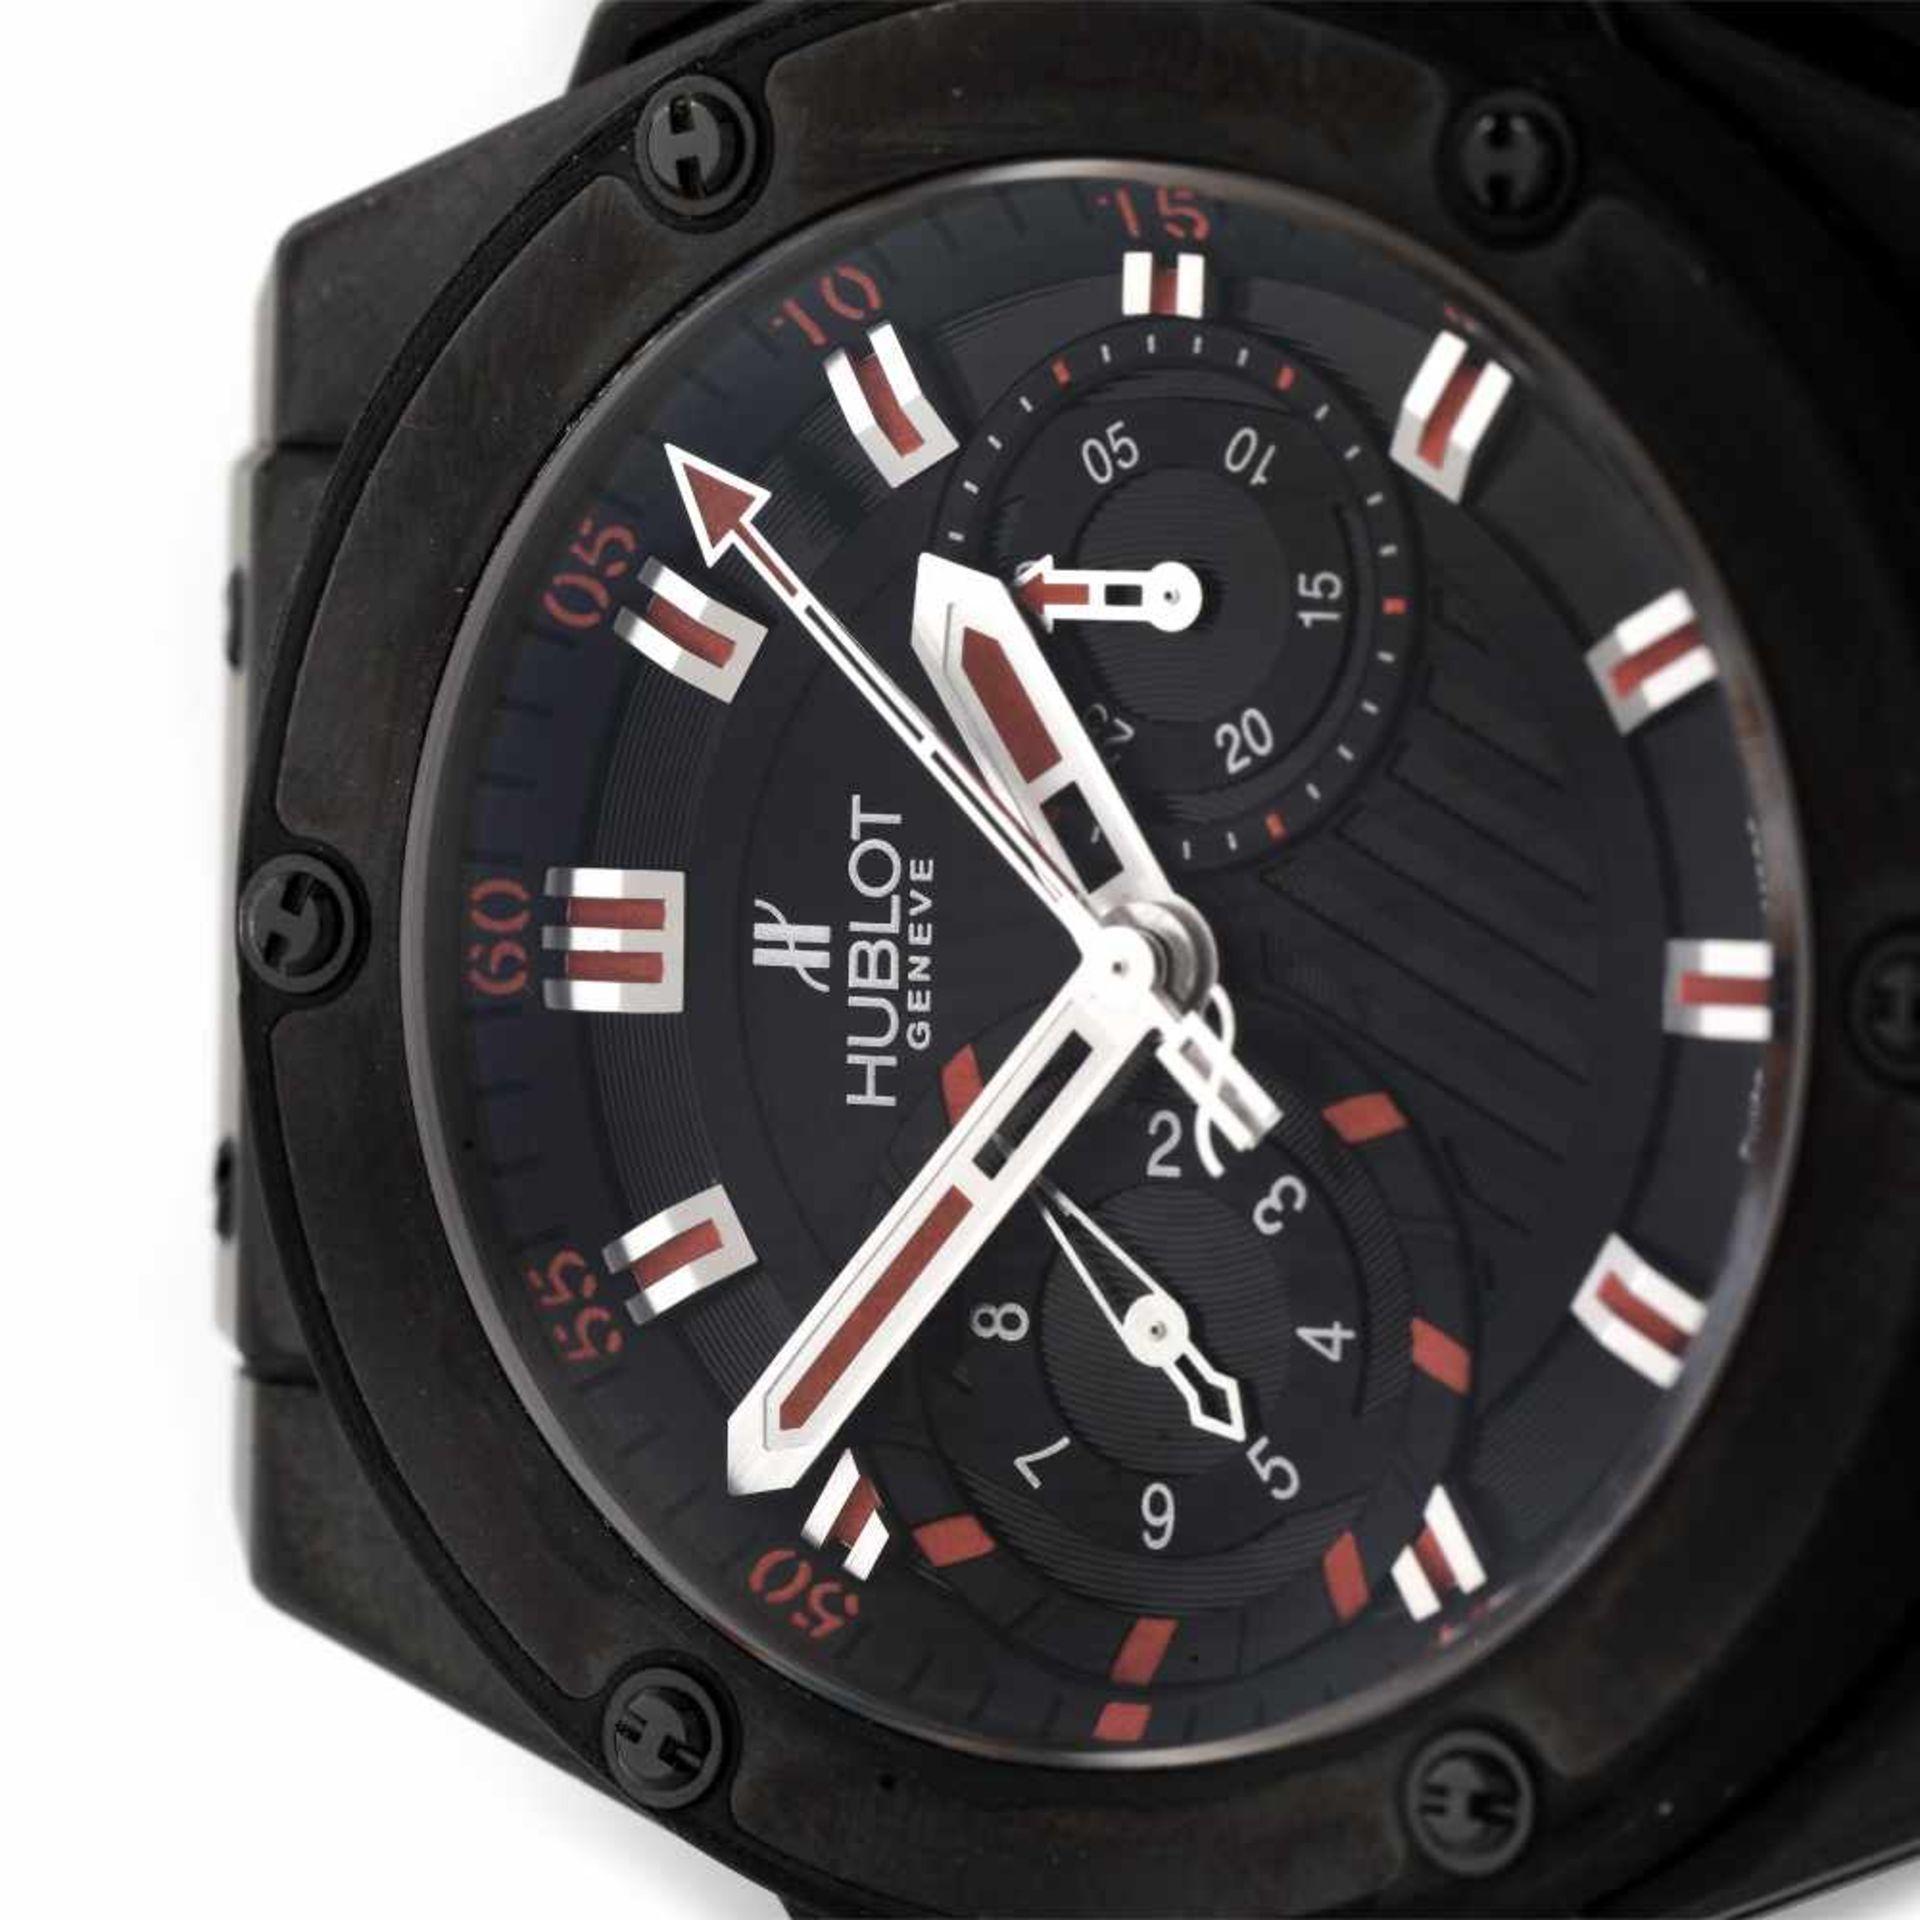 Hublot King Power wristwatch, ceramic, men, limited edition 301/500, provenance documents - Bild 2 aus 4